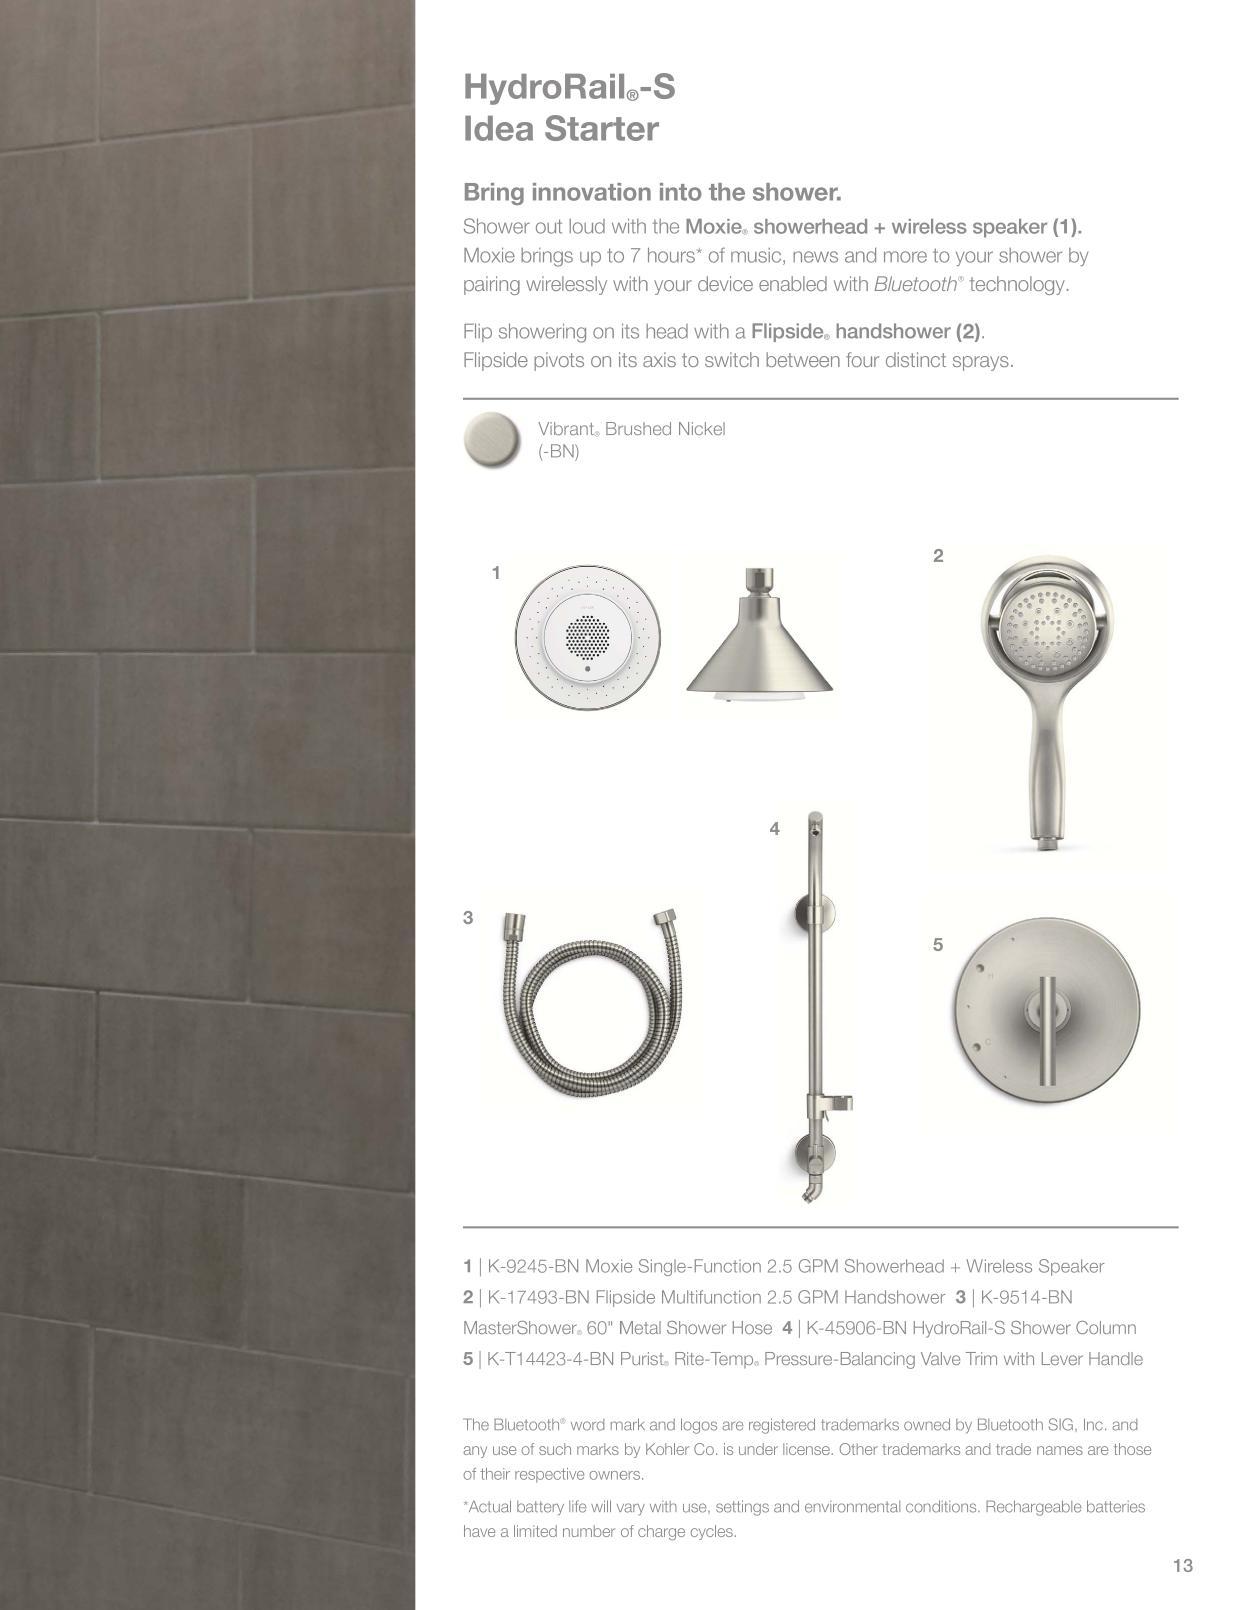 0faa52258a7 Hydrorail Brochure Page 13 - HydroRail Shower Columns